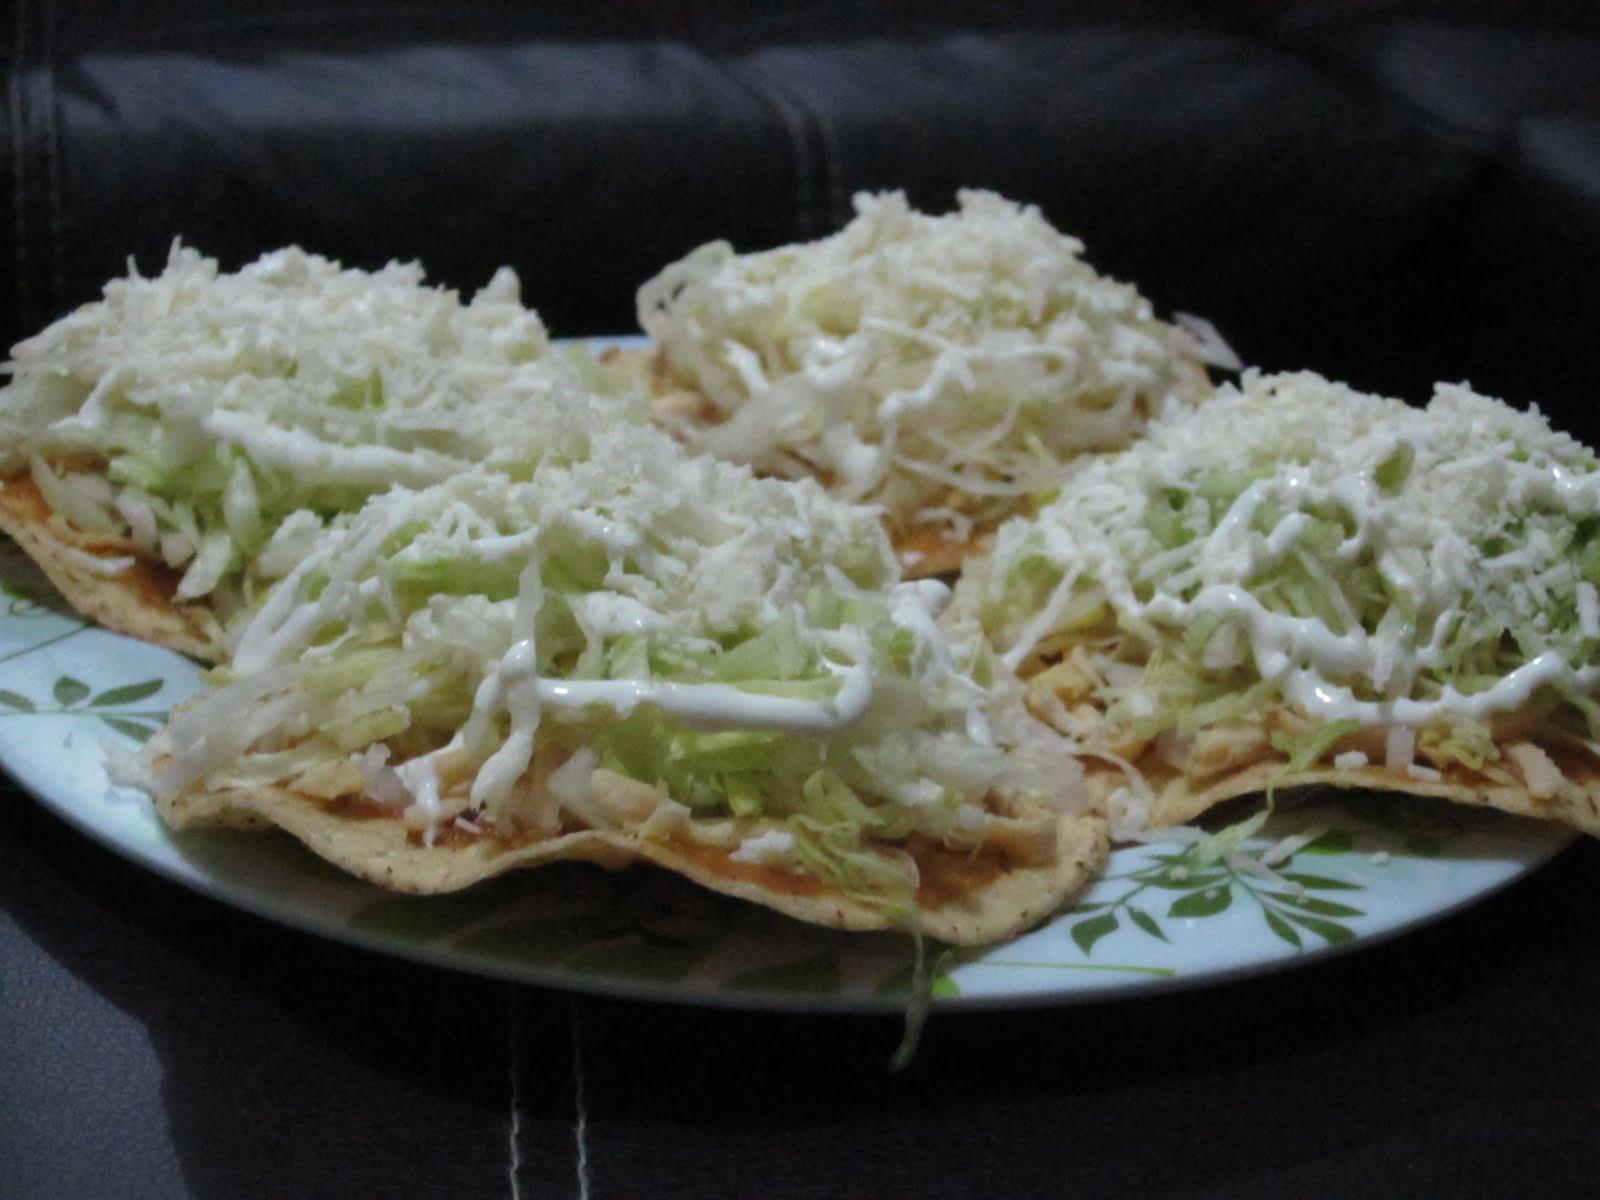 La Gringa Cocina: Tostadas: the 7-layer Chip